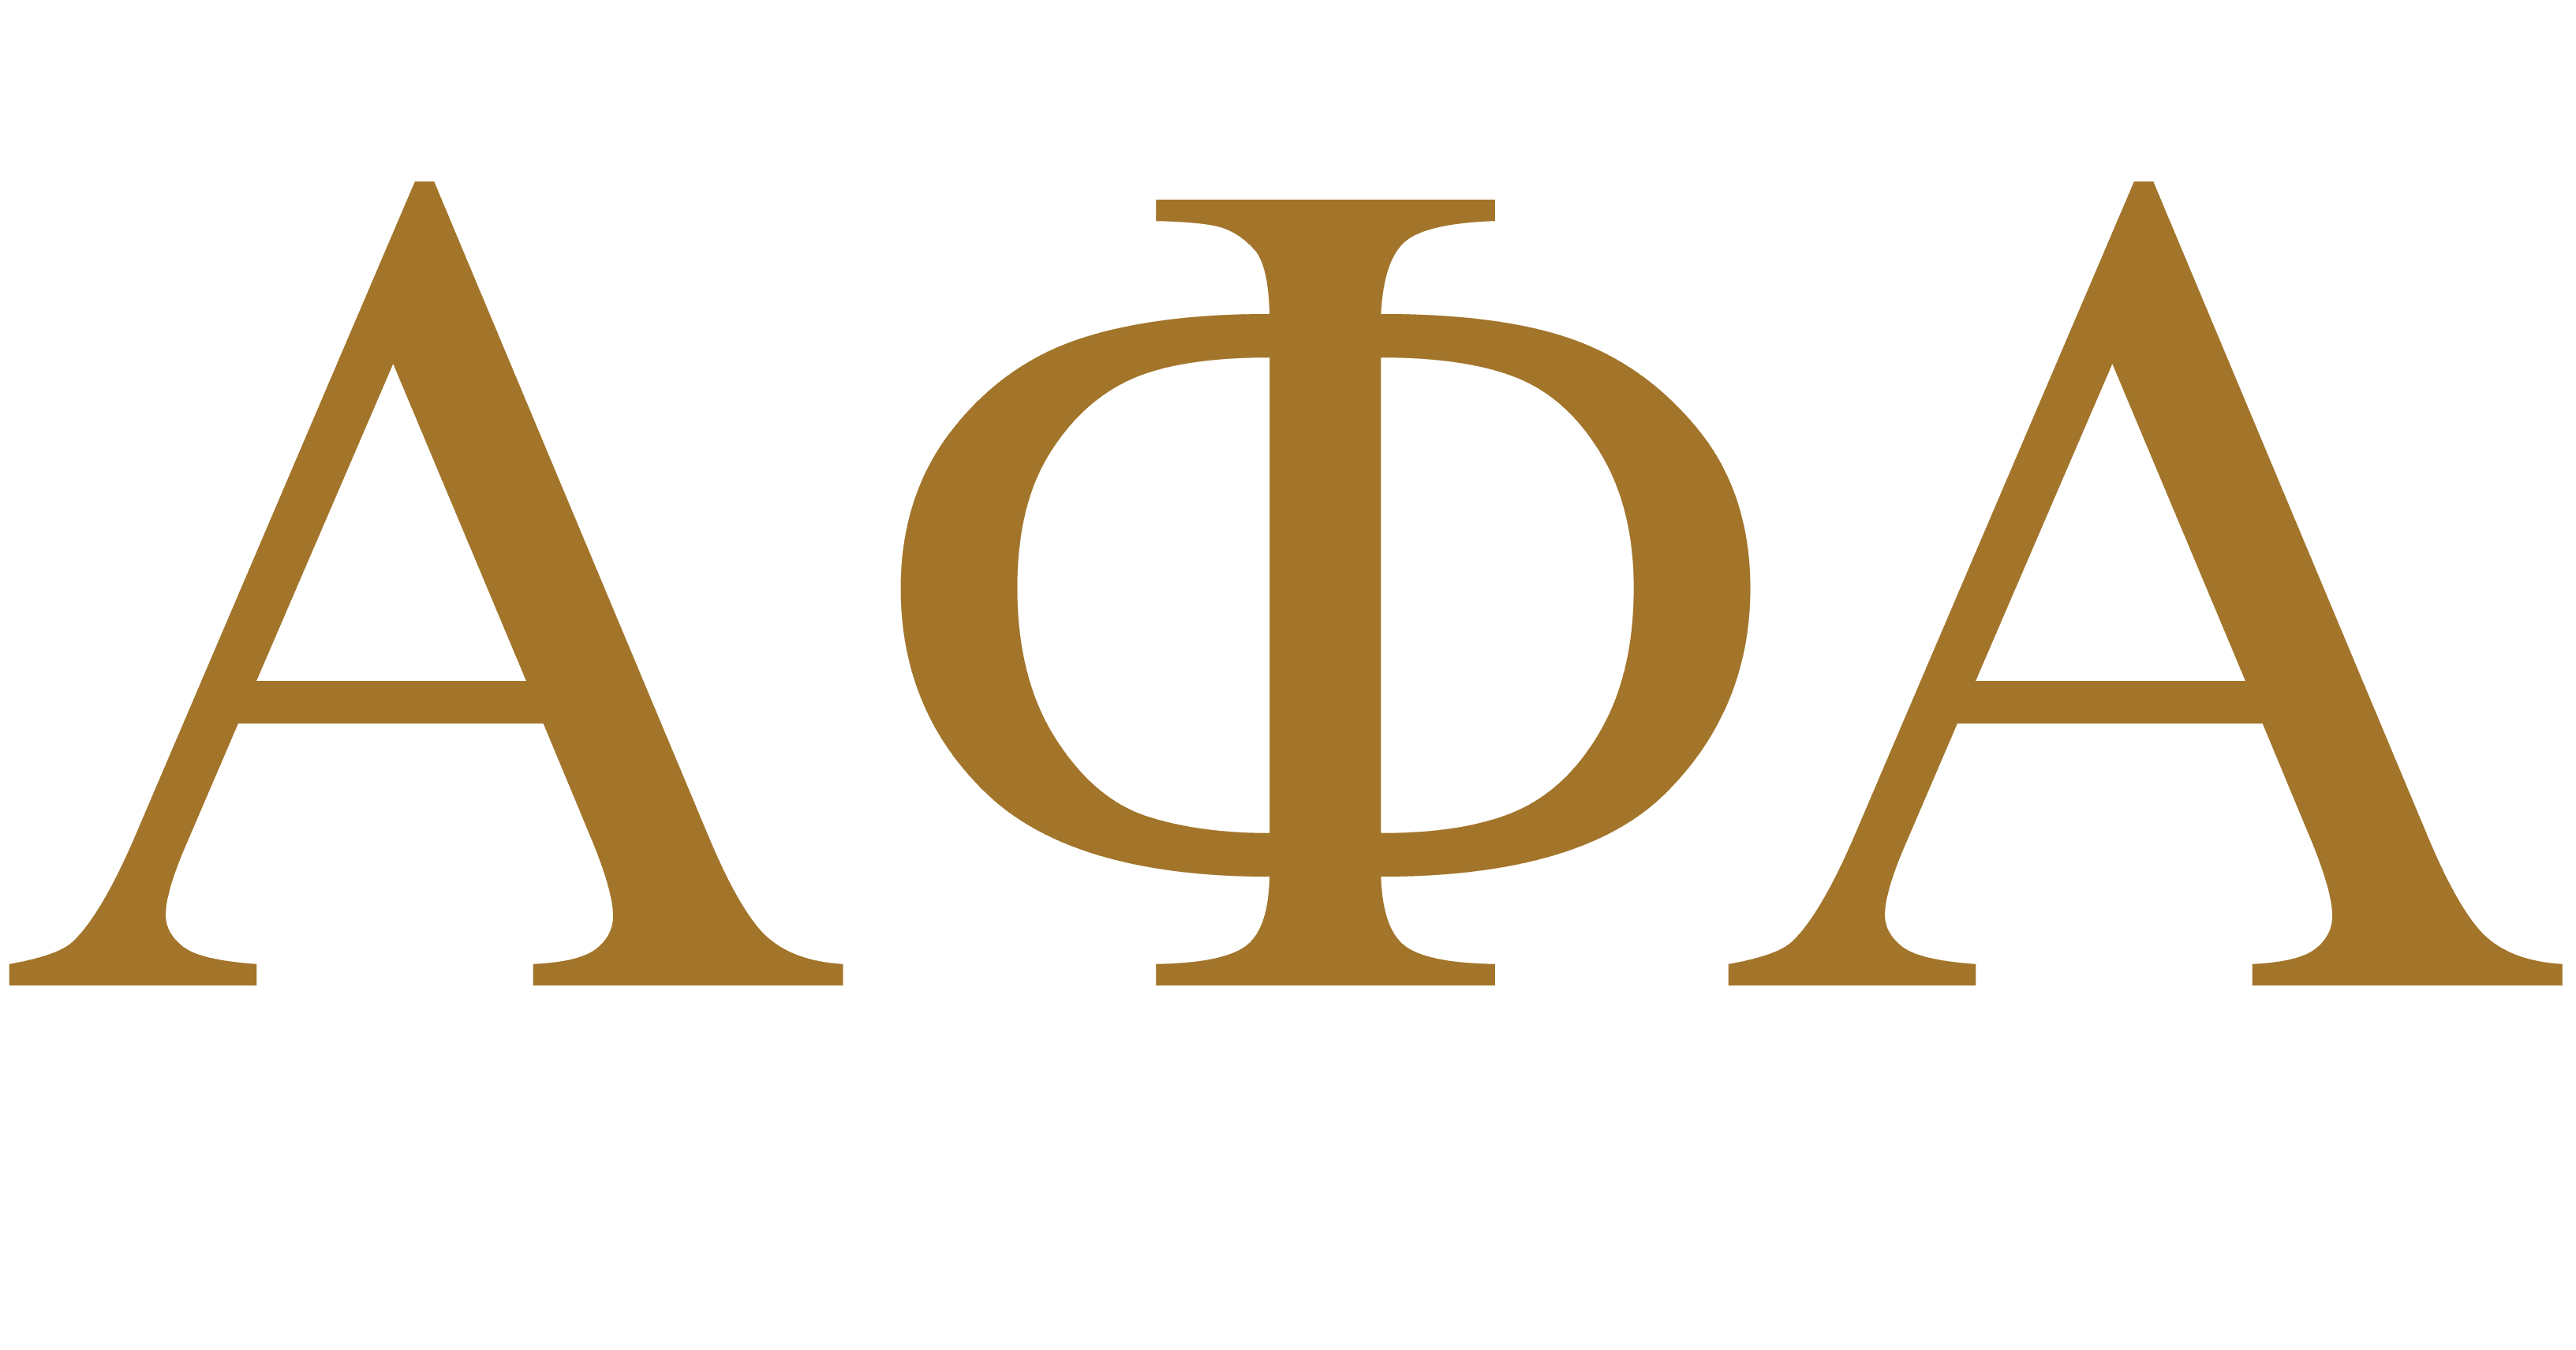 The best scholarships in pennsylvania college rank 28 alpha phi alpha scholarship buycottarizona Images